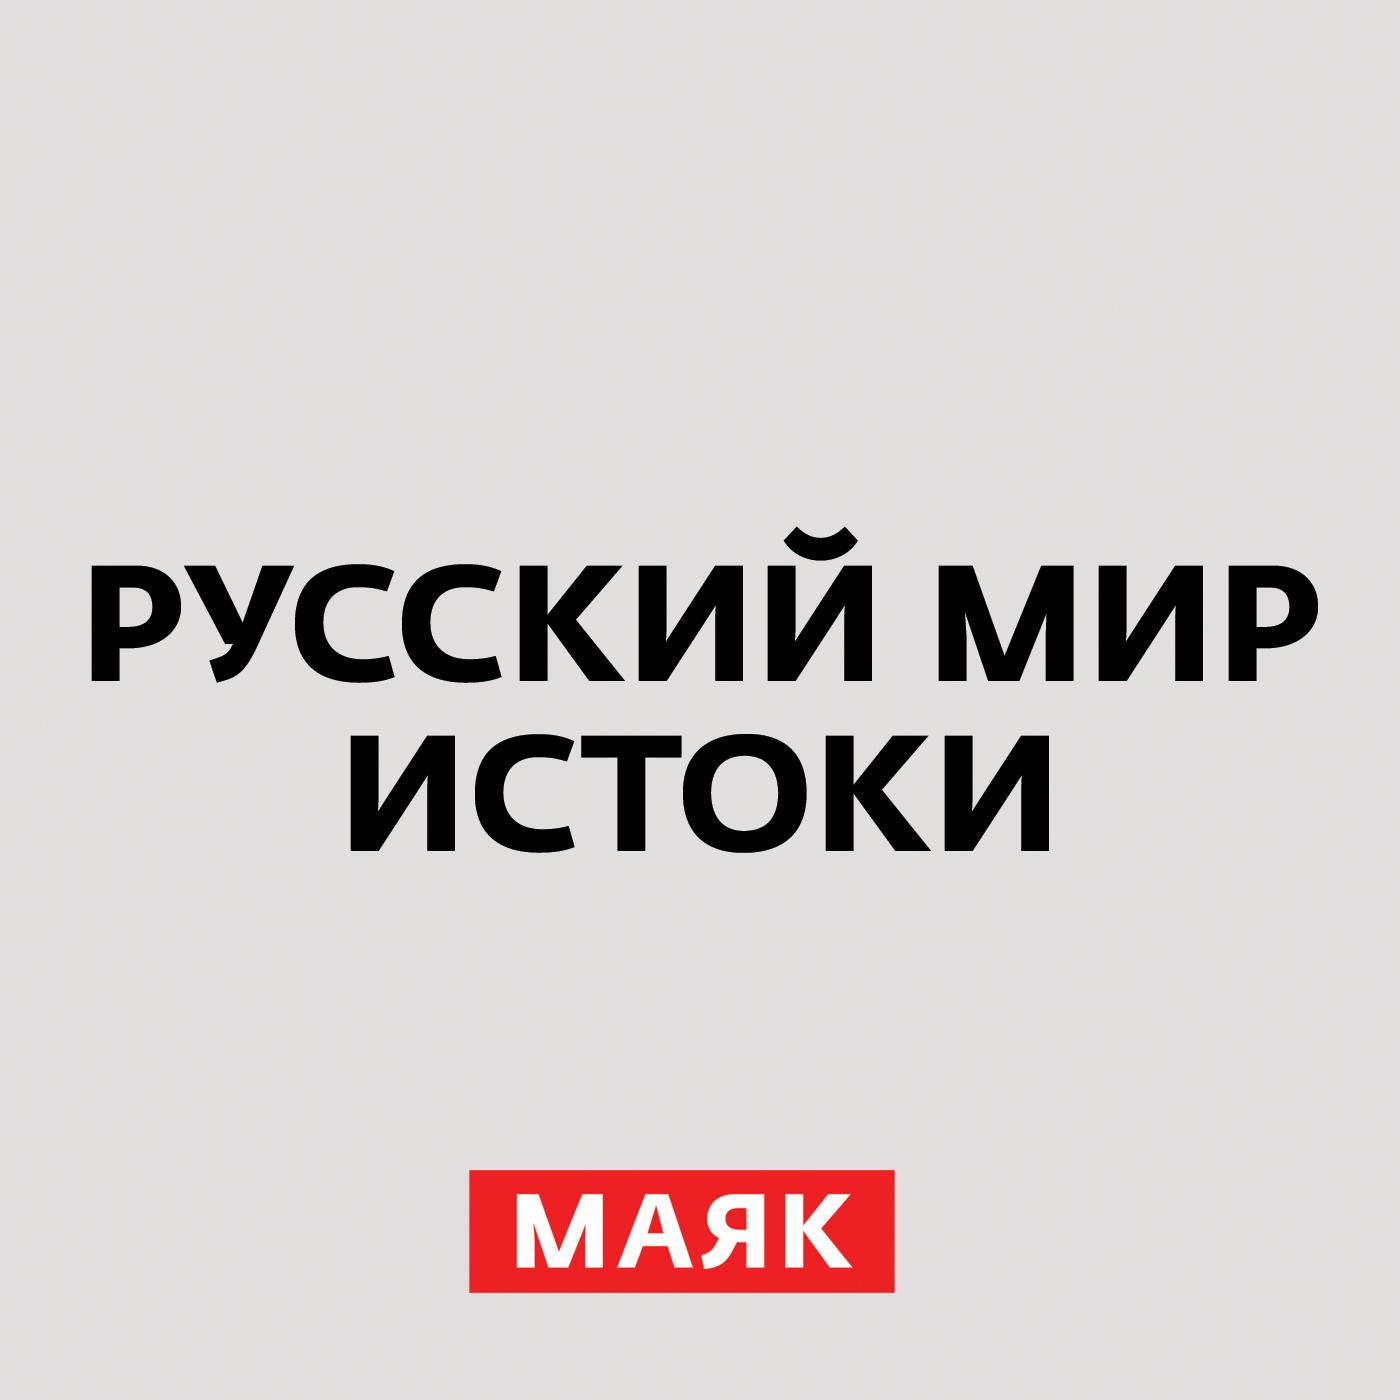 Творческий коллектив радио «Маяк» Василий II Тёмный творческий коллектив радио маяк теща